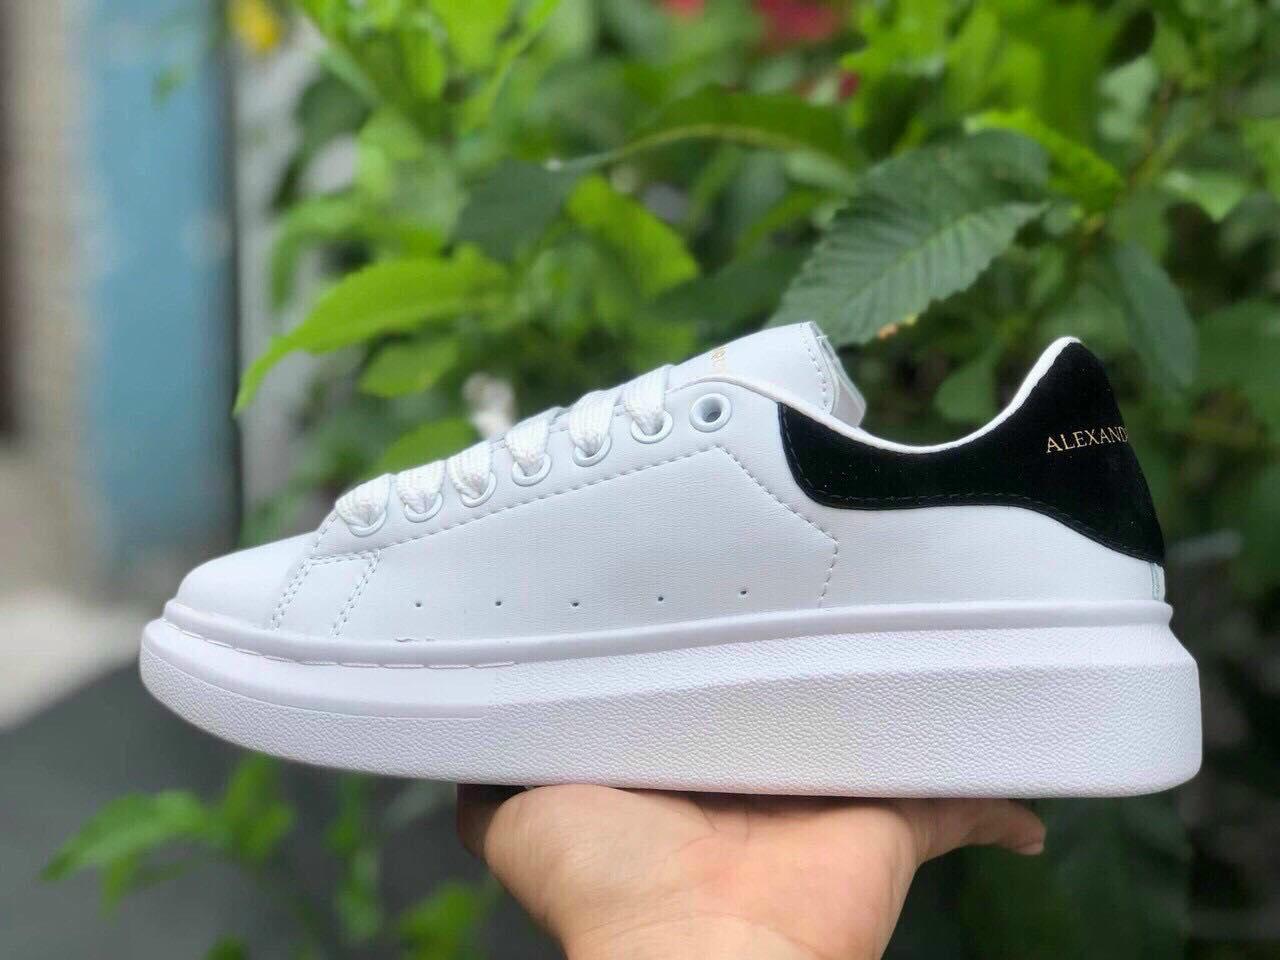 giày alexander mcqueen trắng đen